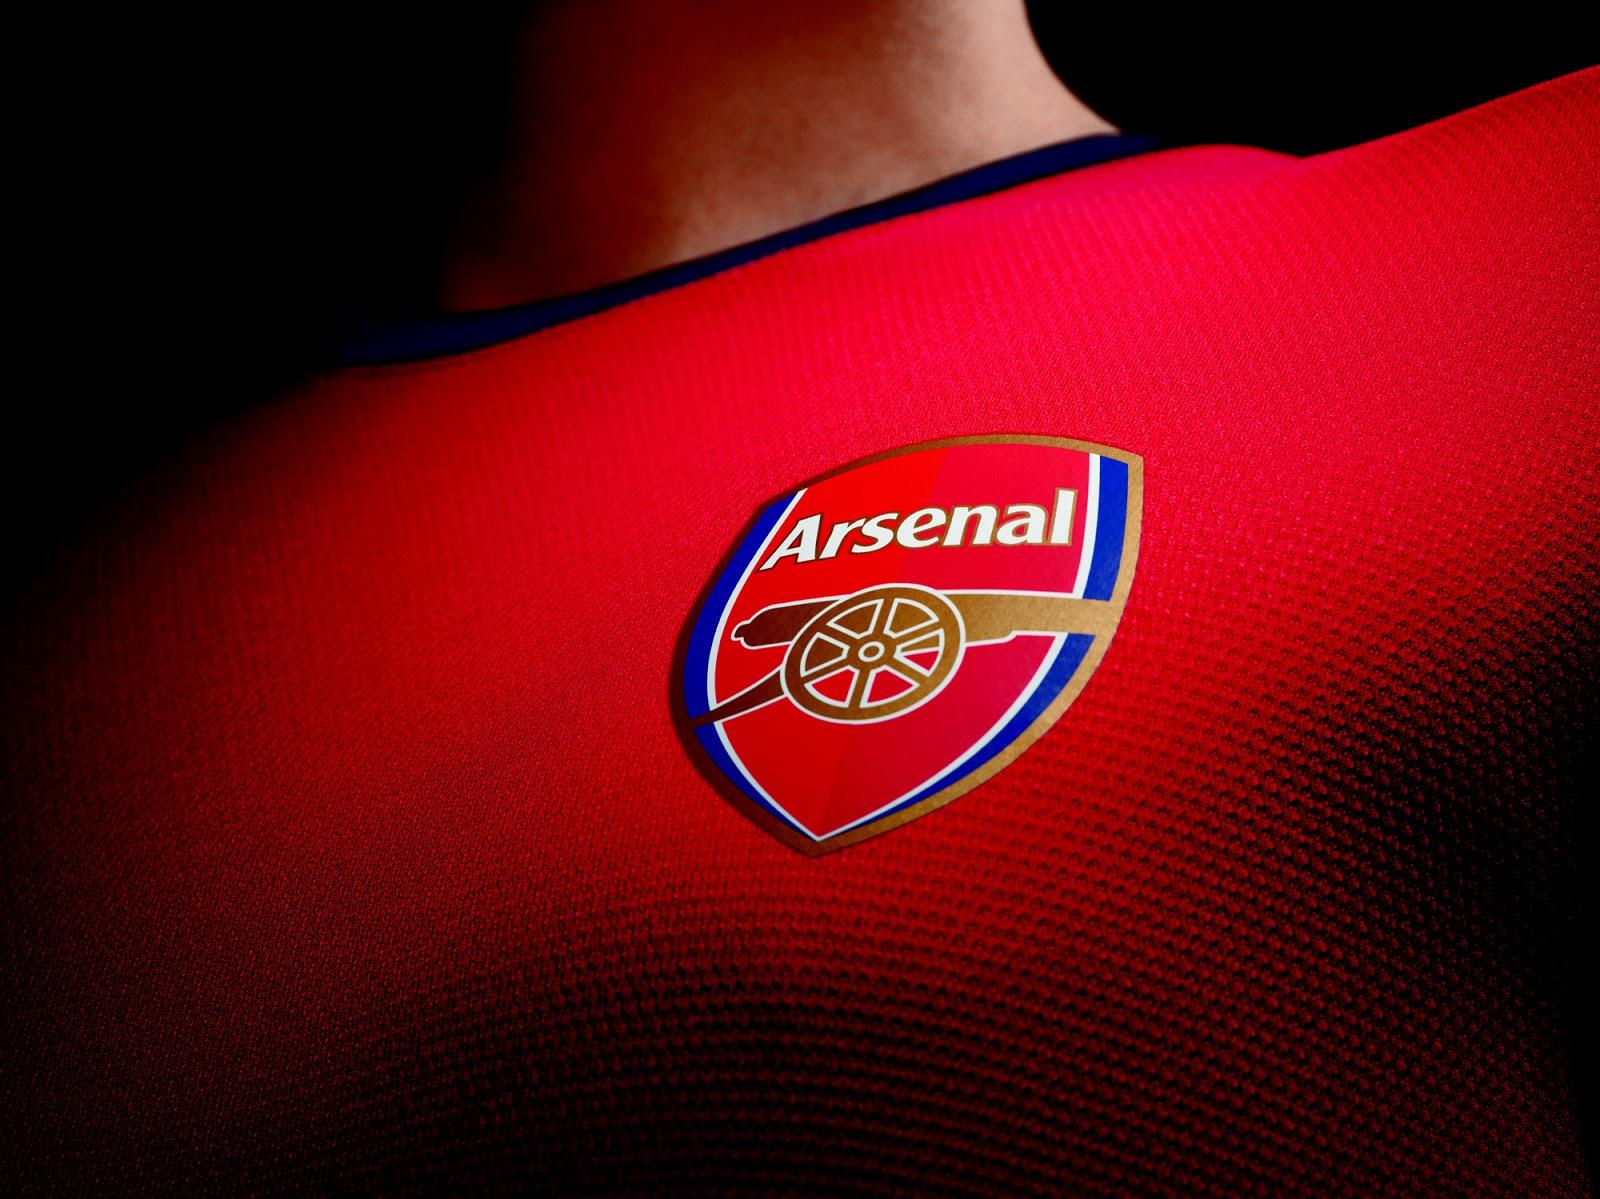 Arsenal FC, Football Club, Red, T-shirt, HD, Sports